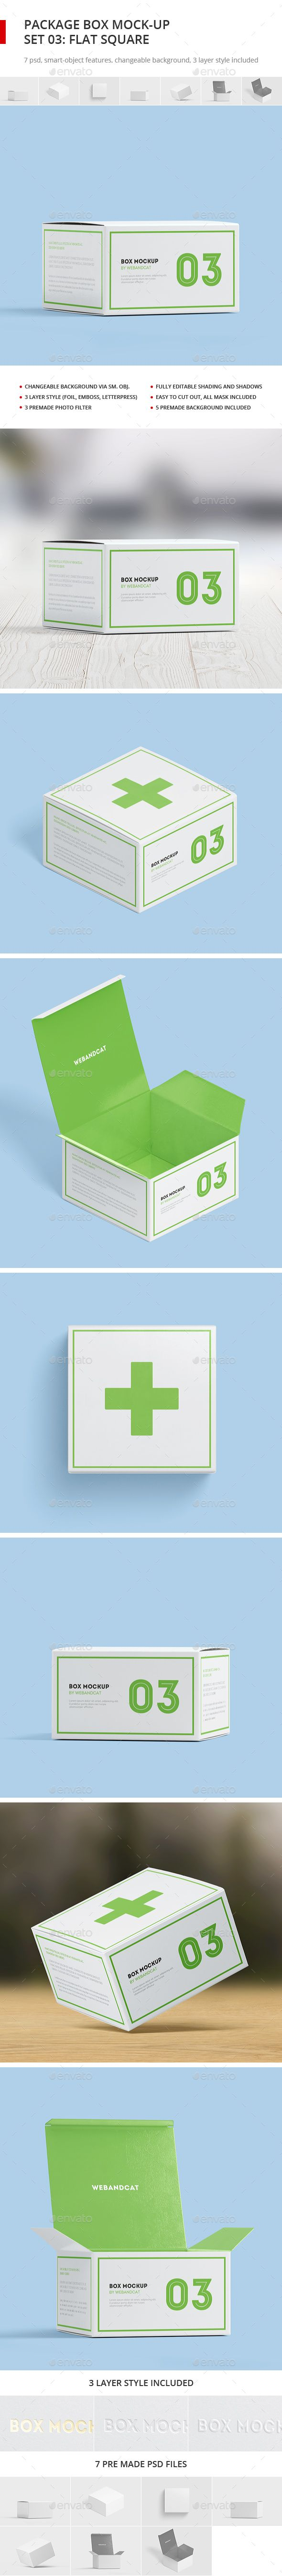 Download Package Box Mock Up Set 3 Flat Square Box Box Mockup Packaging Mockup Mockup Design